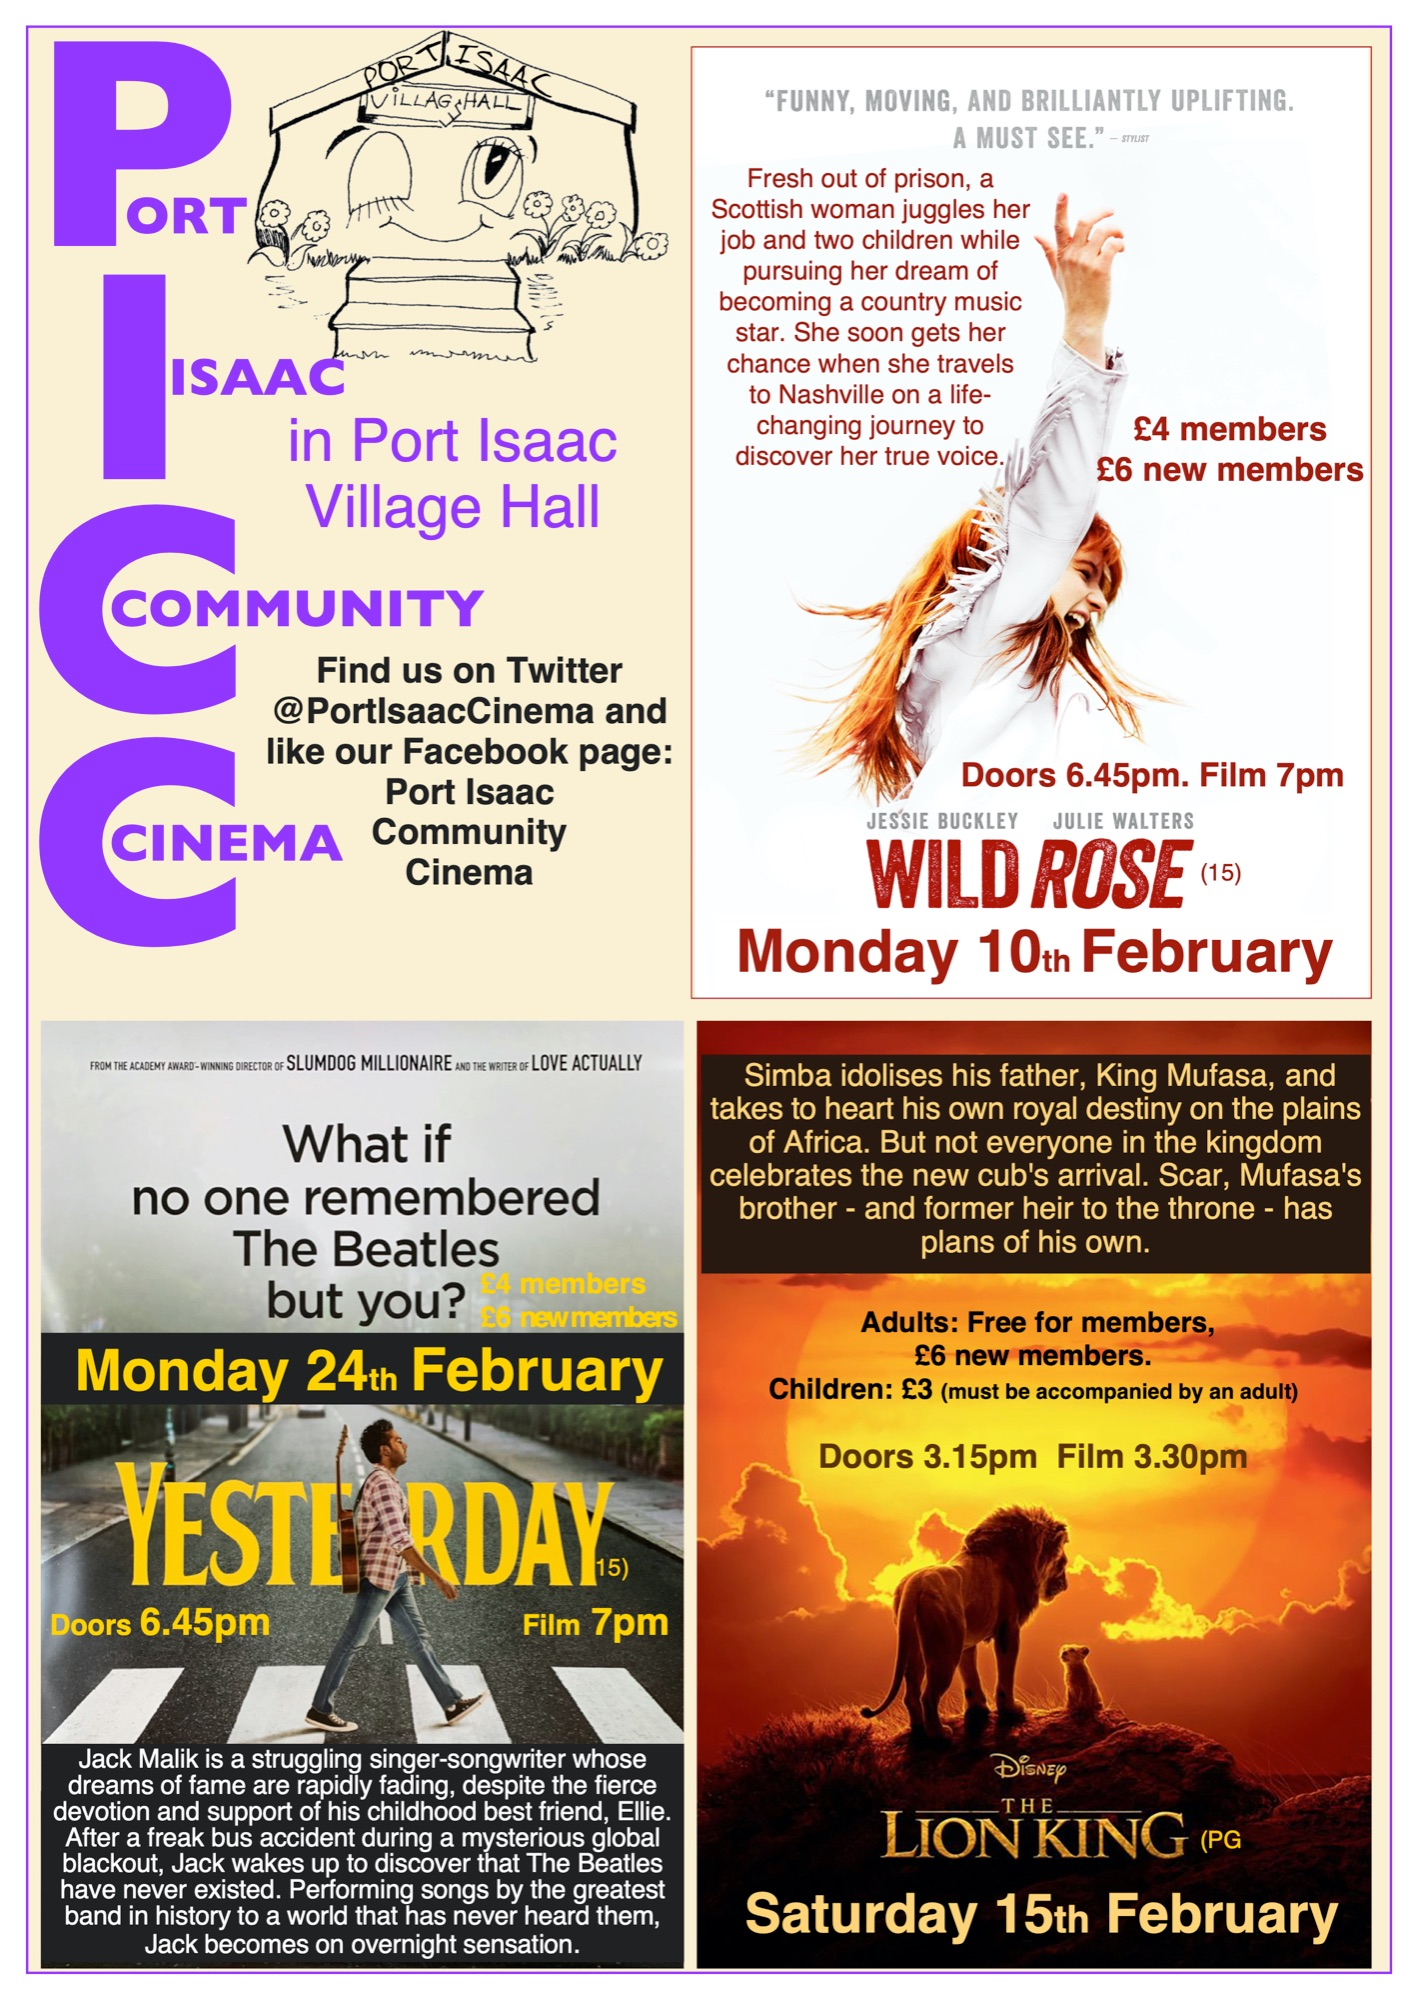 PICC Feb poster